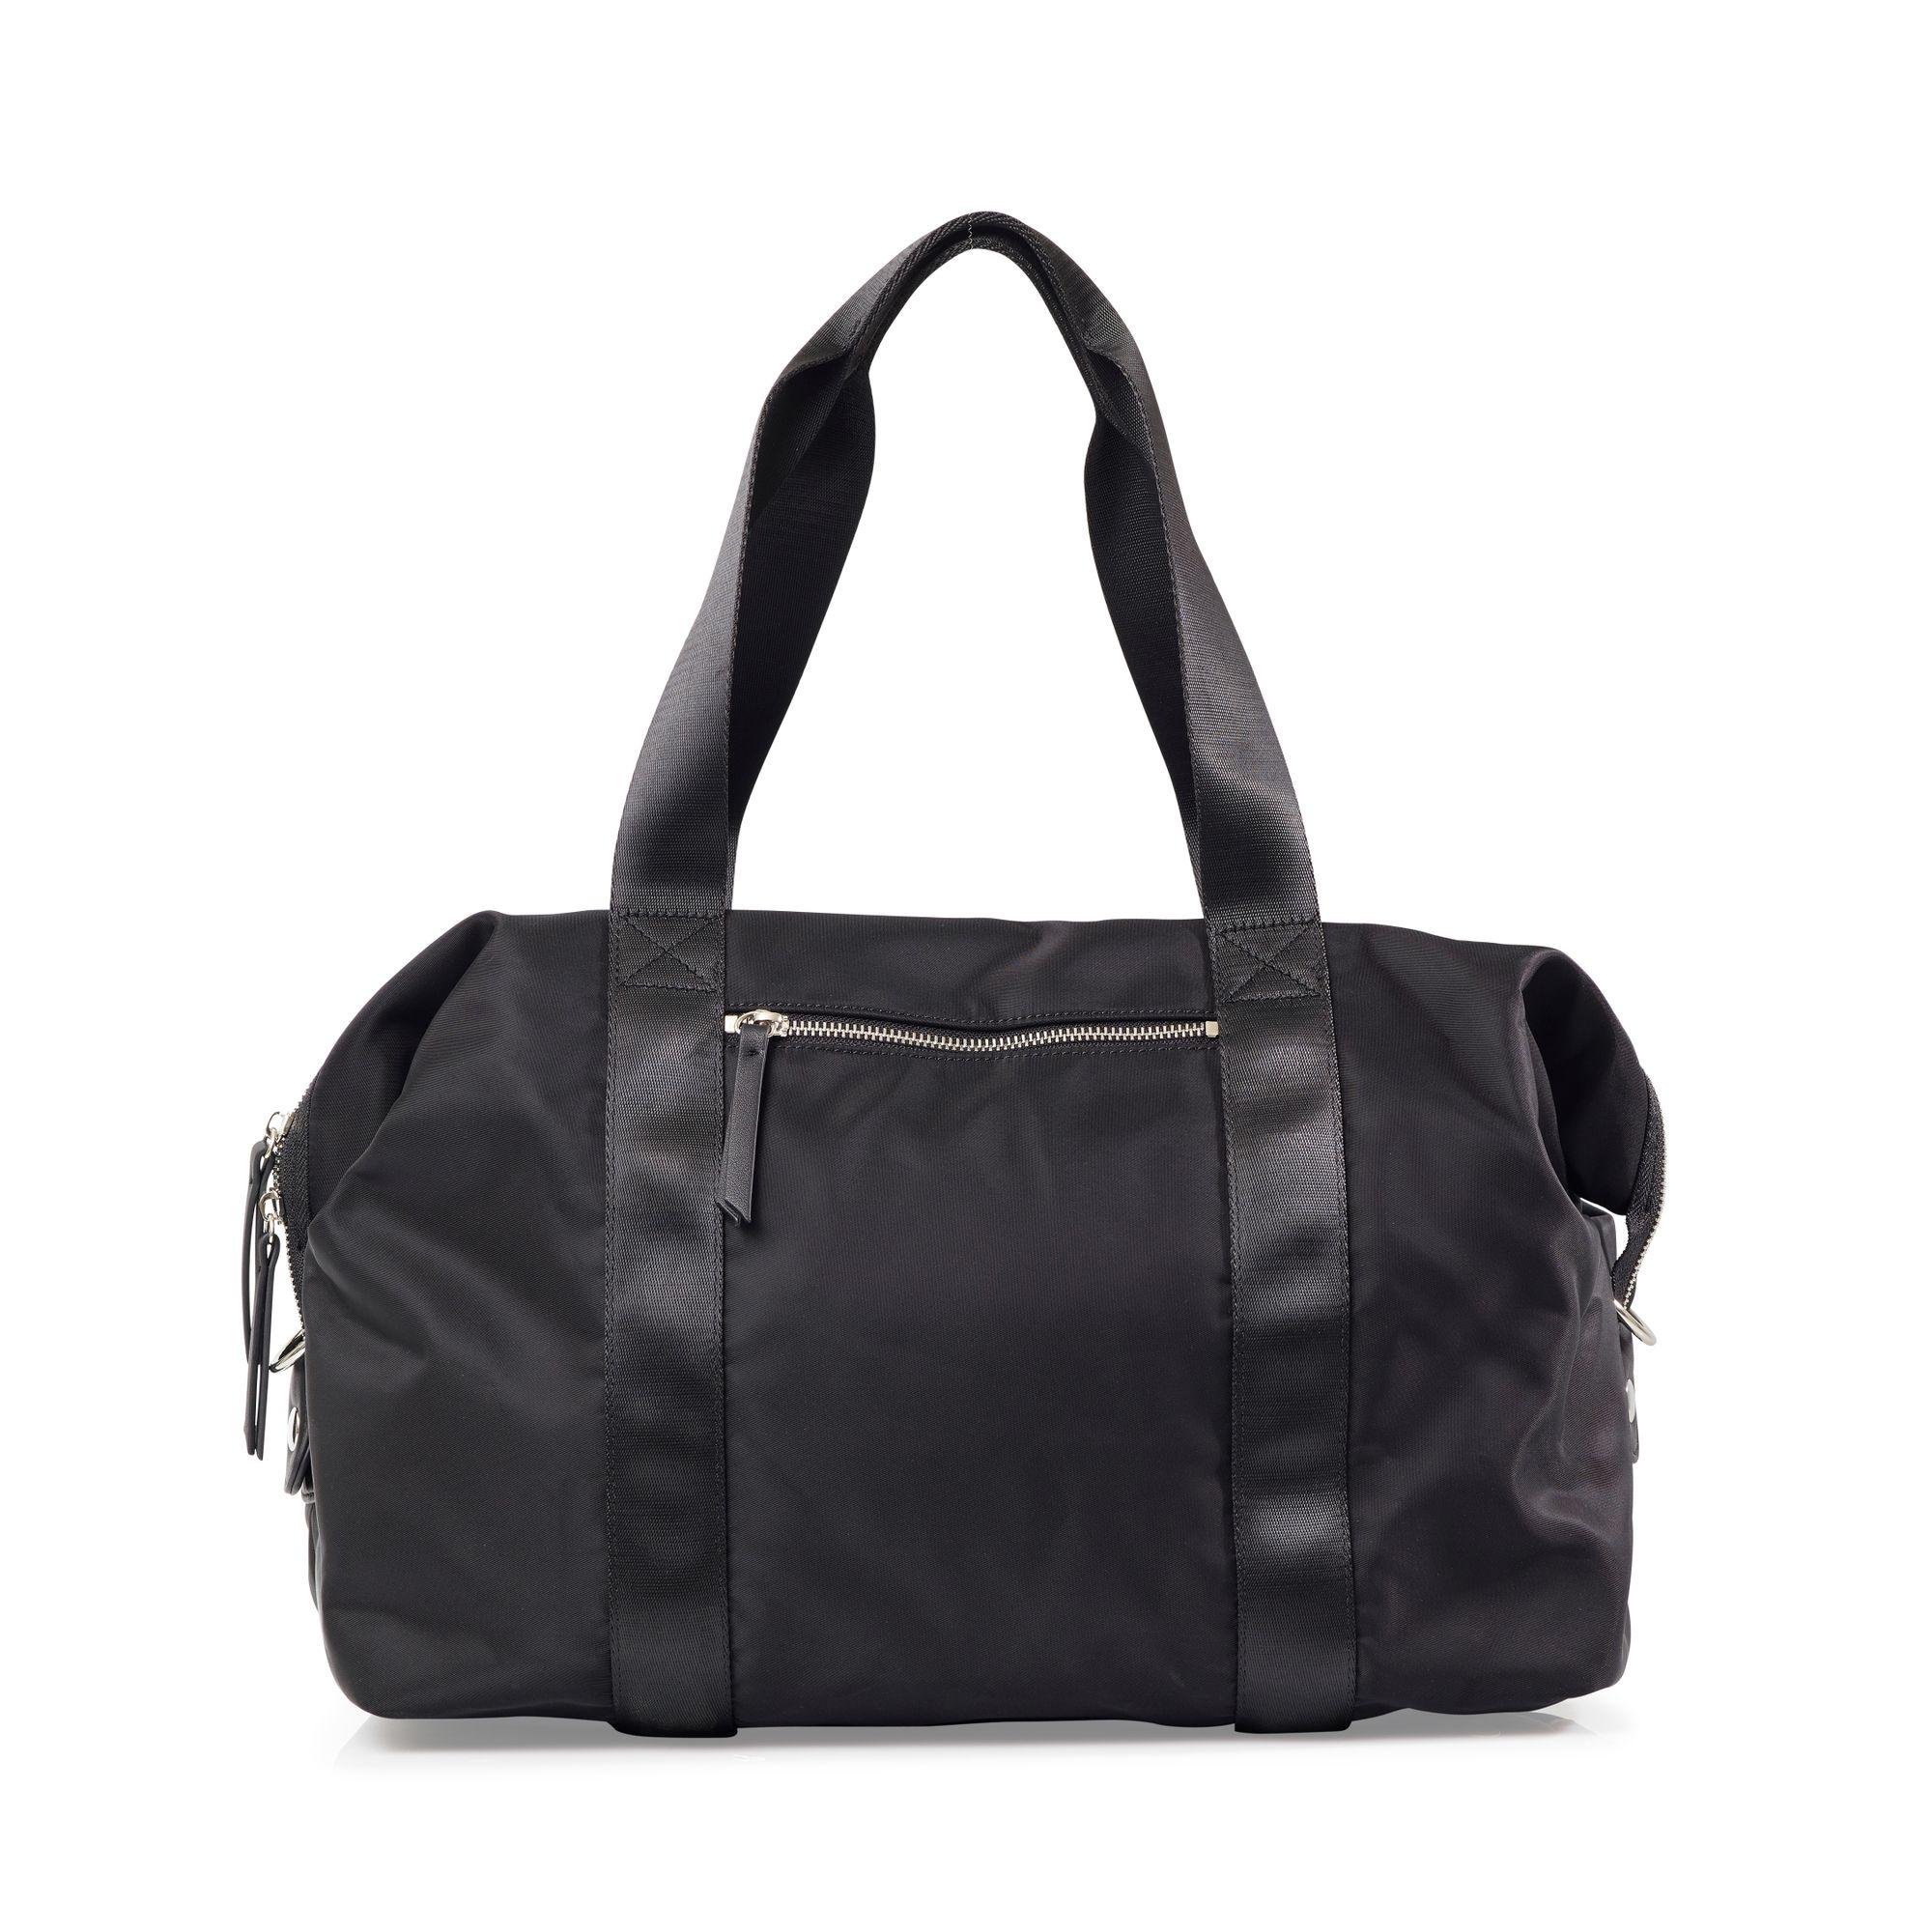 Don Donna Janice Weekend Bag väska i nylon, Svart